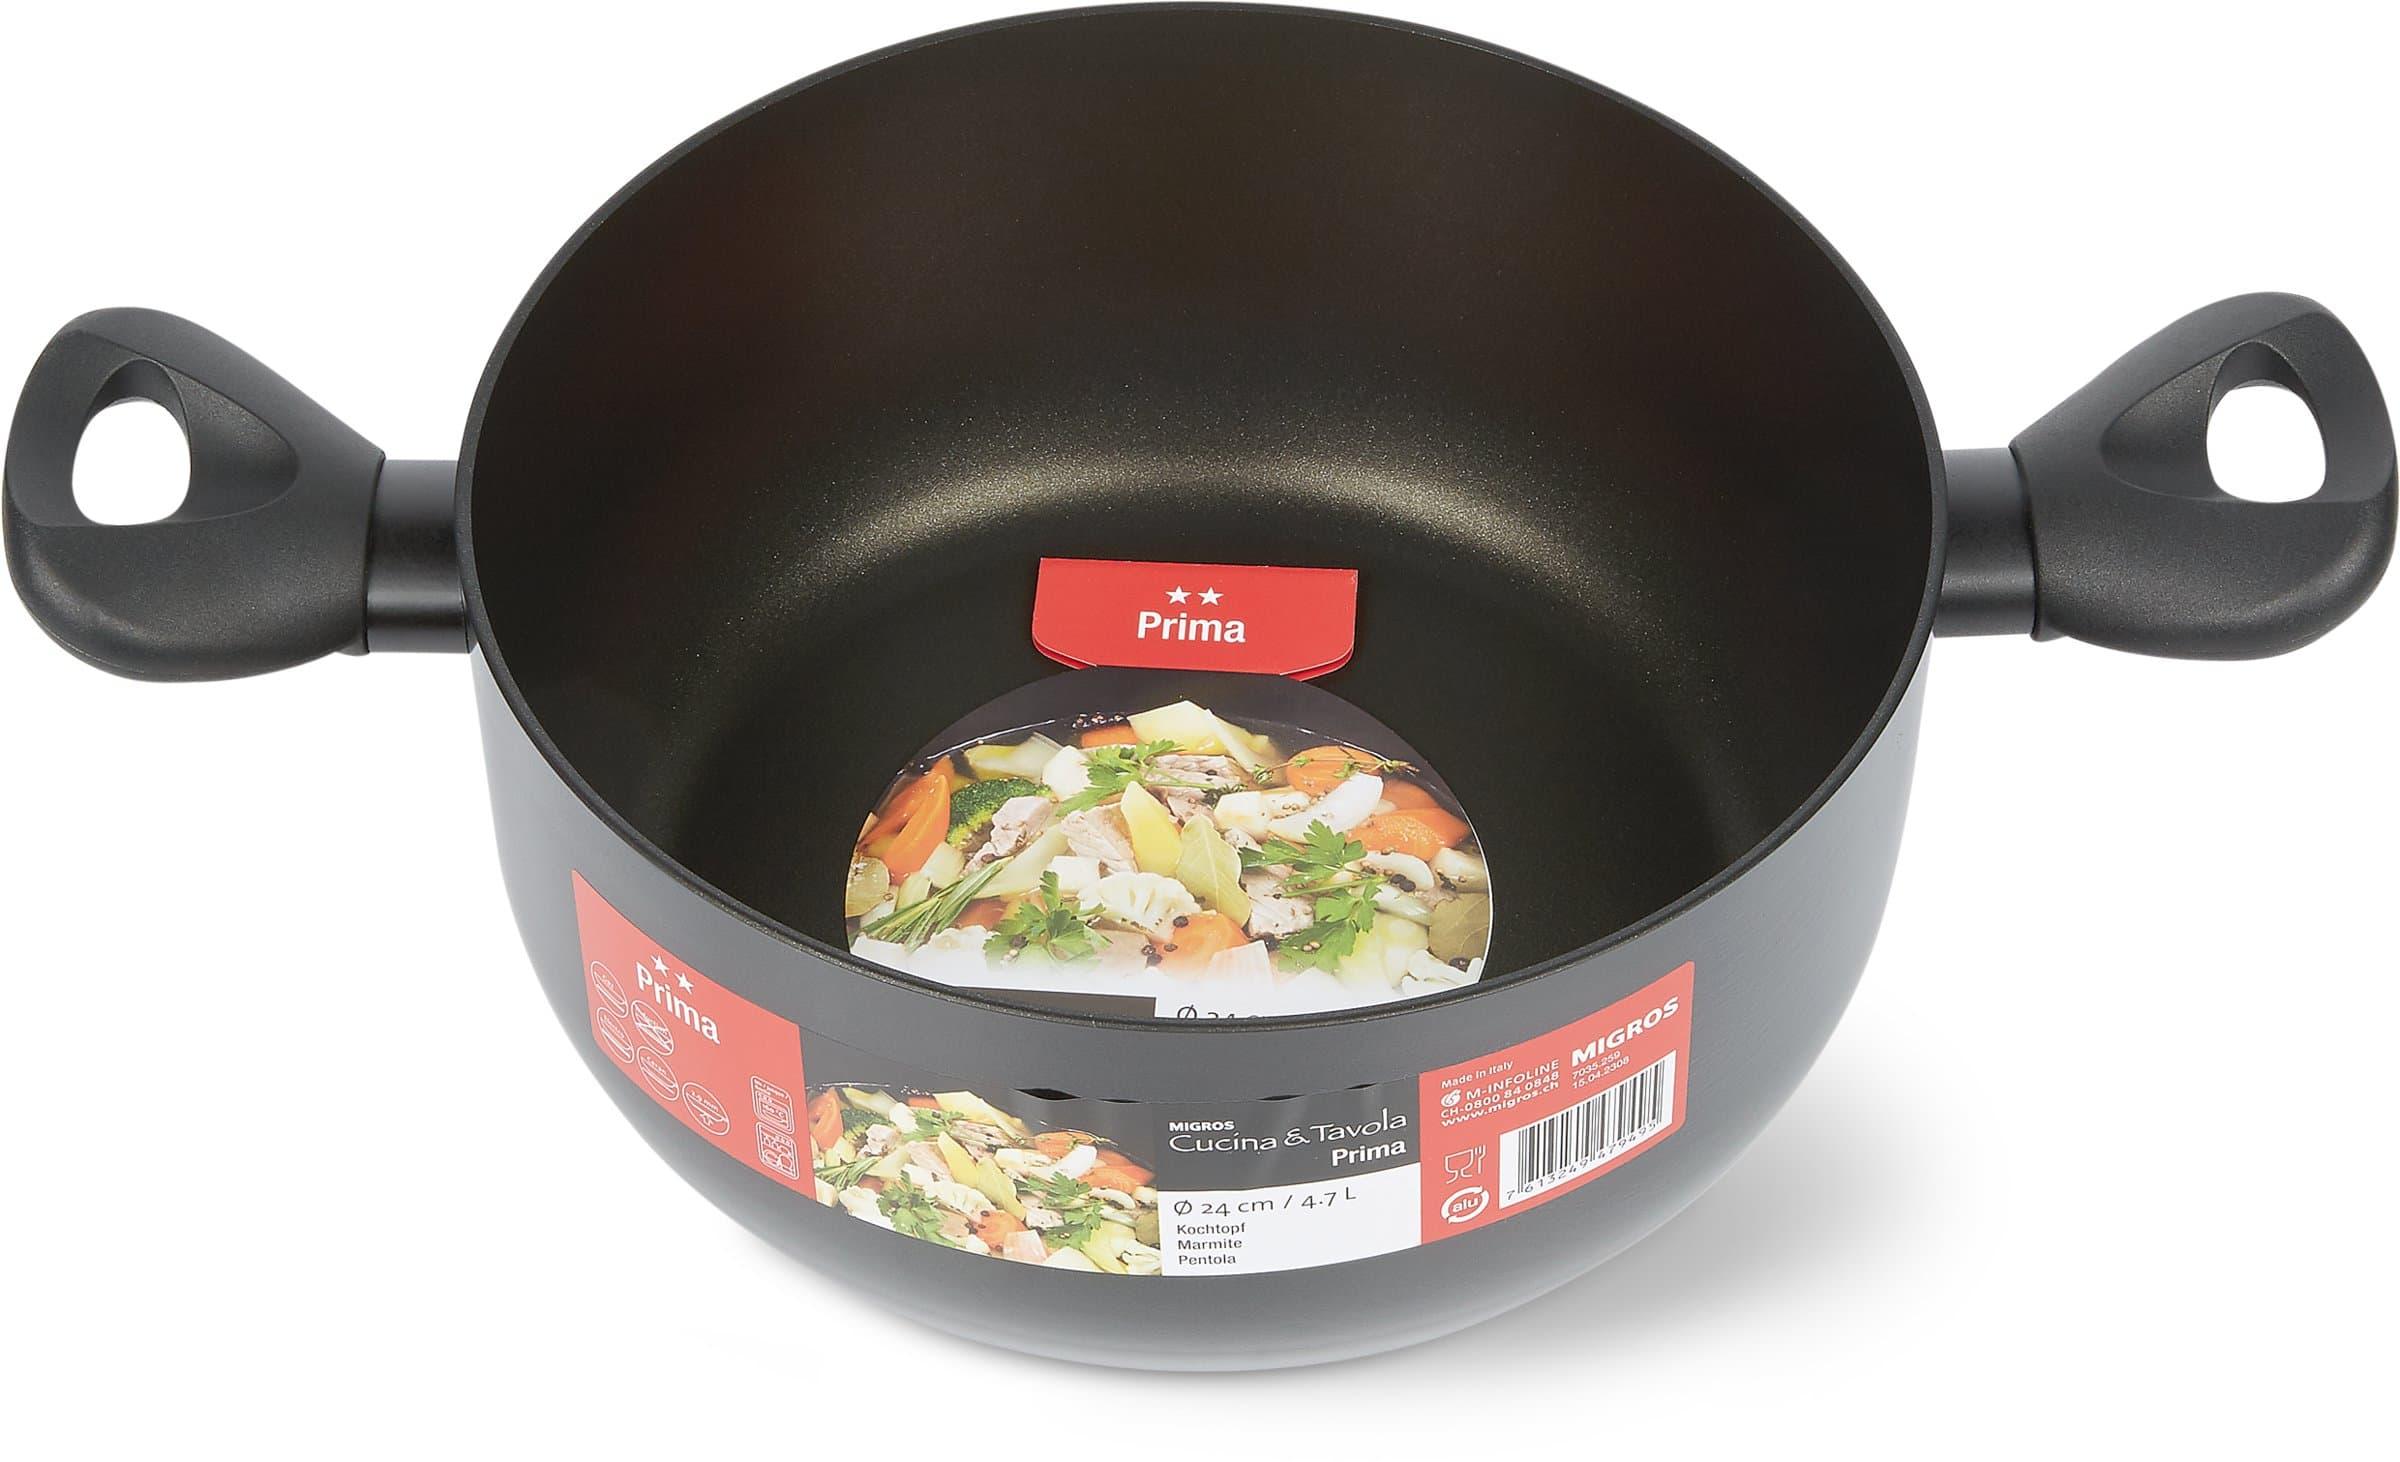 Cucina & Tavola PRIMA Marmite